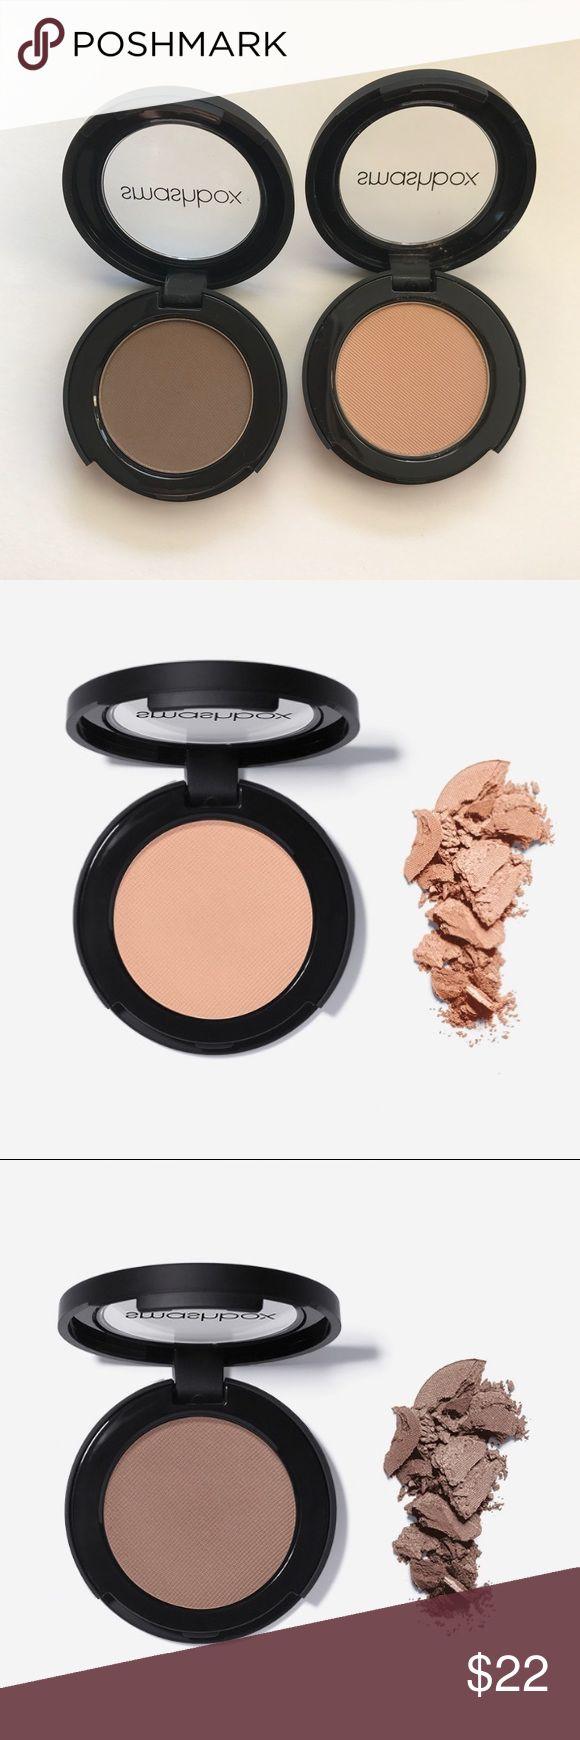 ▪️Smashbox Eyeshadow Bundle▪️Cruise▪️Wheat▪️NIB▪️ 2 brand new in the box Smashbox Photo Op Eye Shadows▪️Wheat (nude color)▪️Cruise (gray/brown)▪️Both are matte▪️Selling together▪️ Smashbox Makeup Eyeshadow